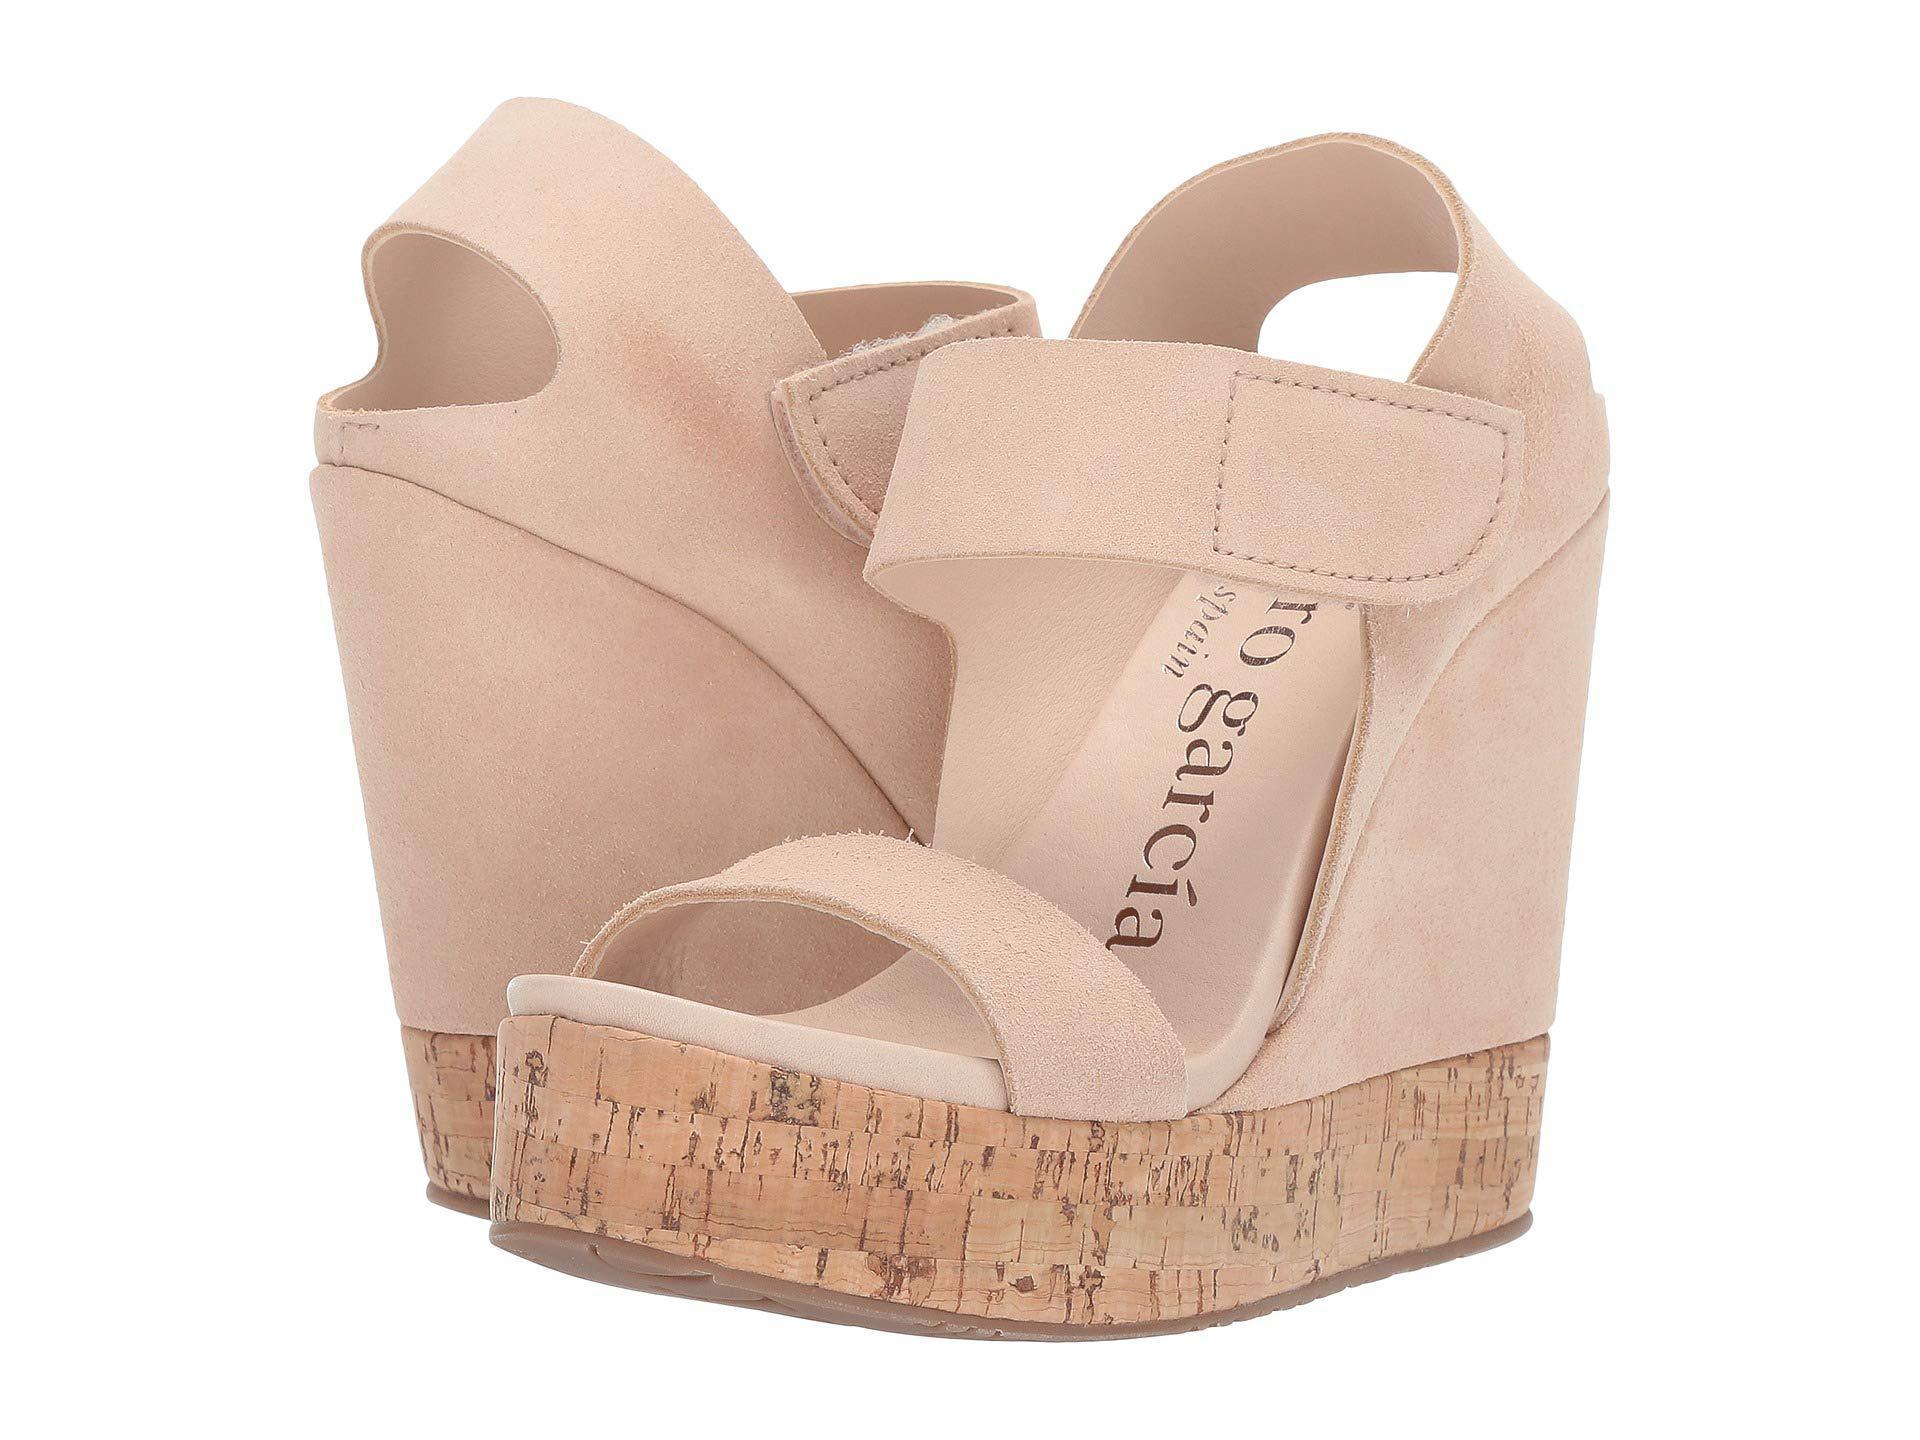 0d5dad51fd1 Lyst - Pedro Garcia Taina (plume Castoro) Women s Shoes